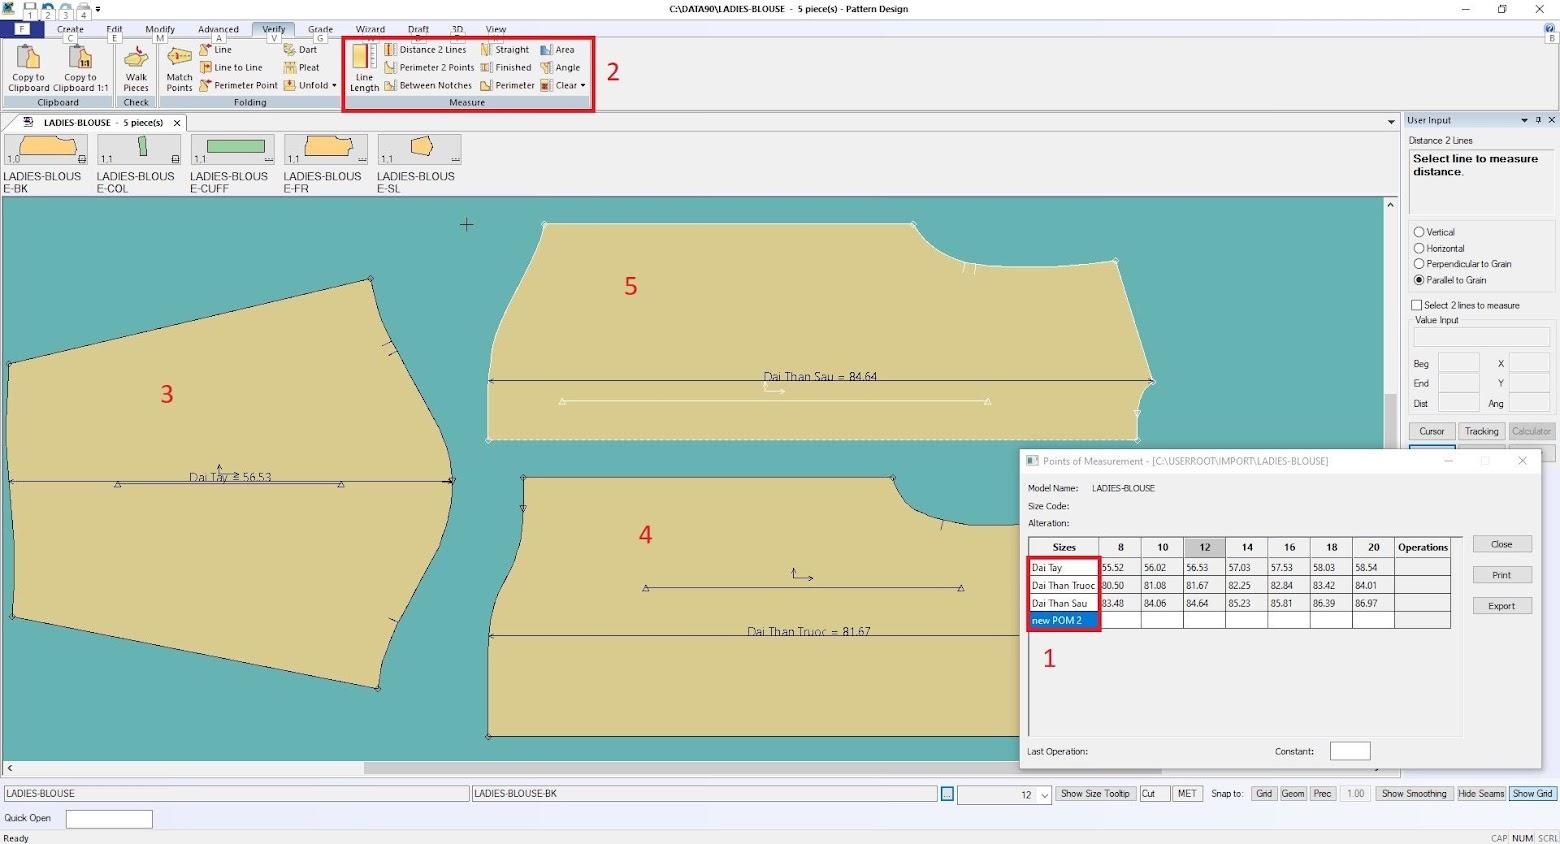 Gerber Pattern Design Point of Measurement: Cách Tạo Bảng Đo Thông Số 9